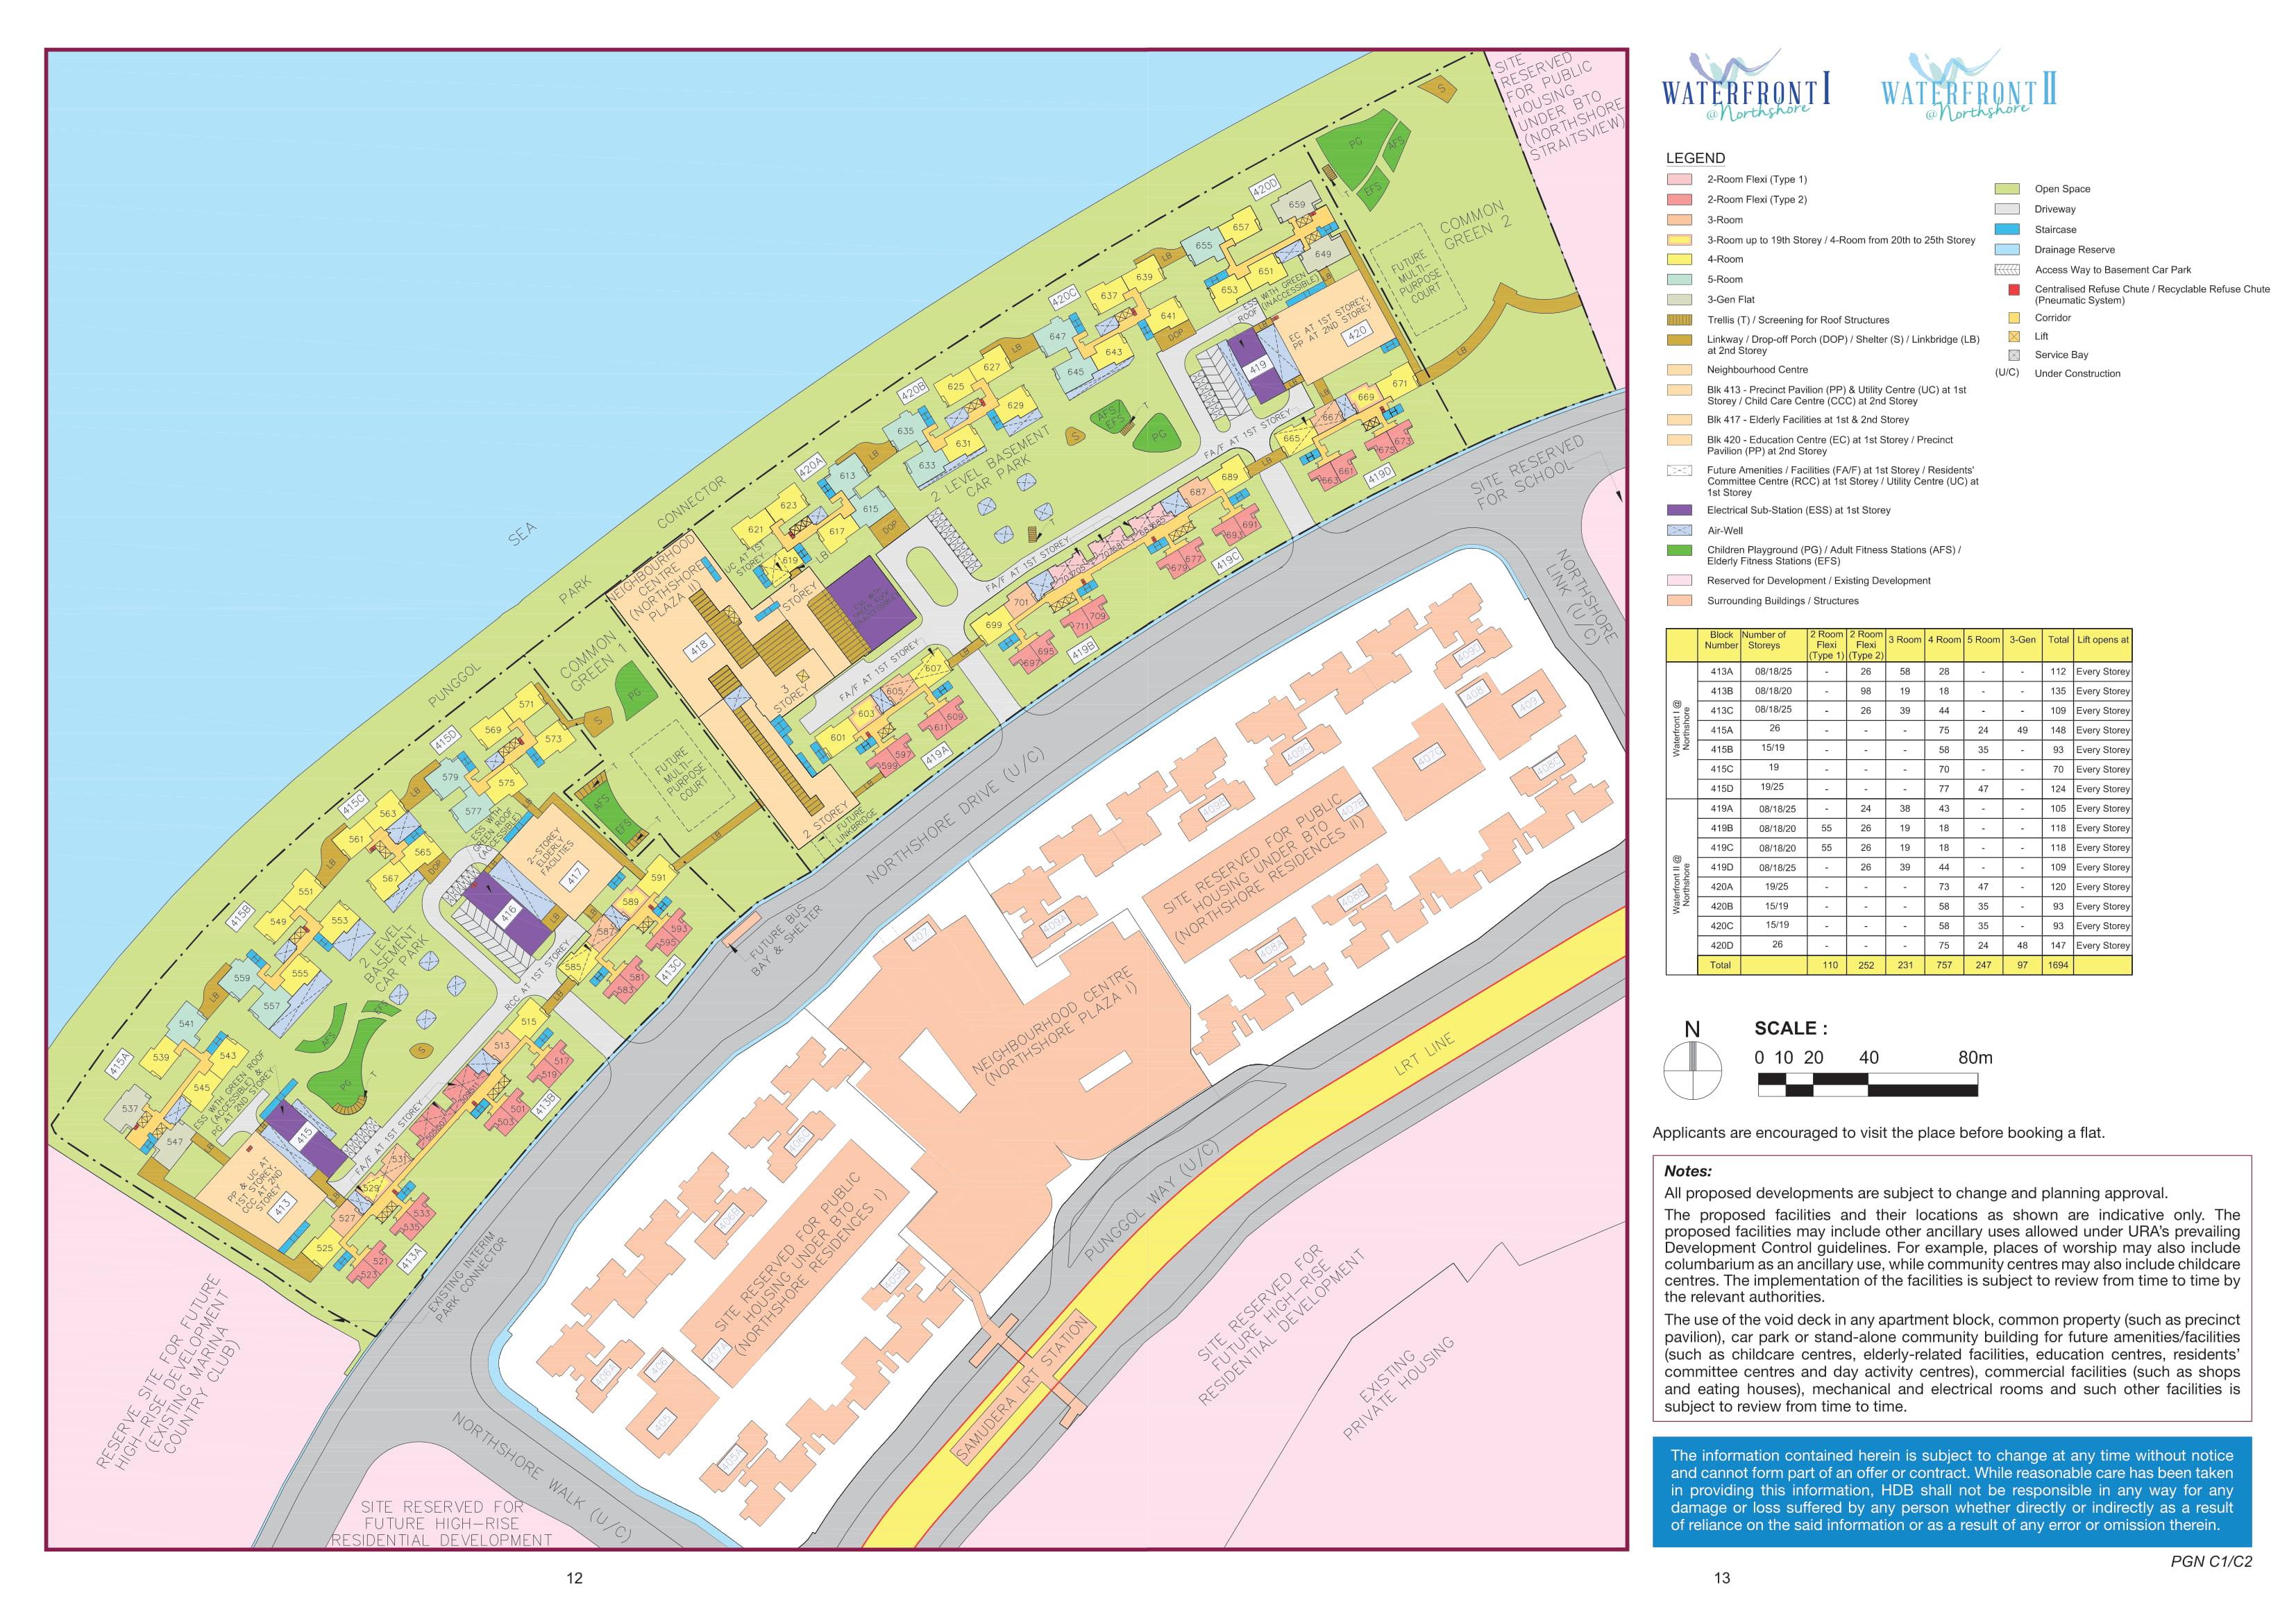 Waterfront I @ Northshore Site Plan